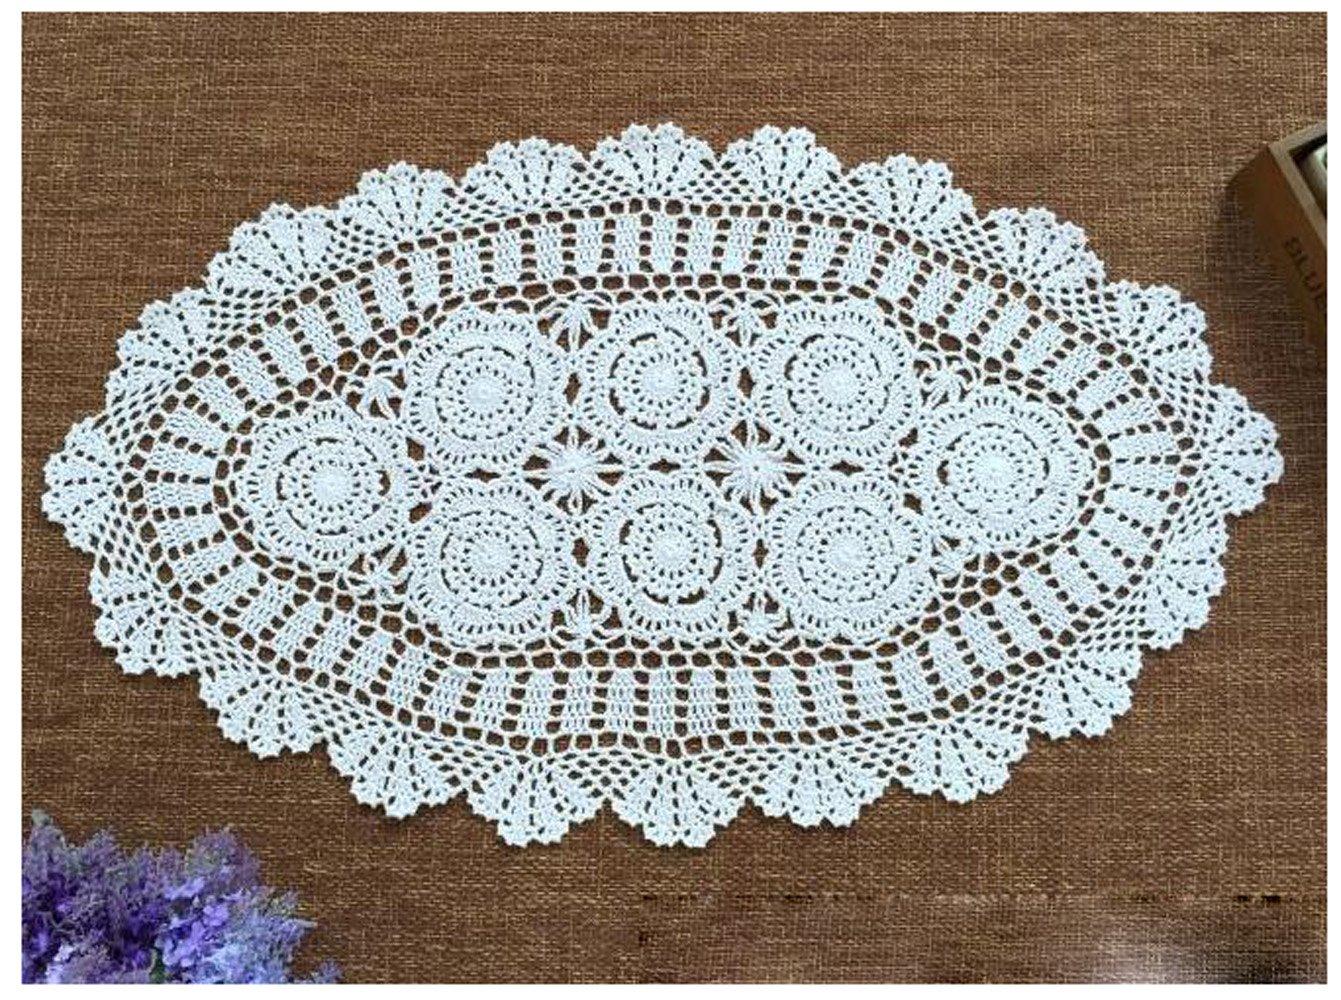 Amazon.com: wchuang Oval Crochet encaje de algodón Manteles ...